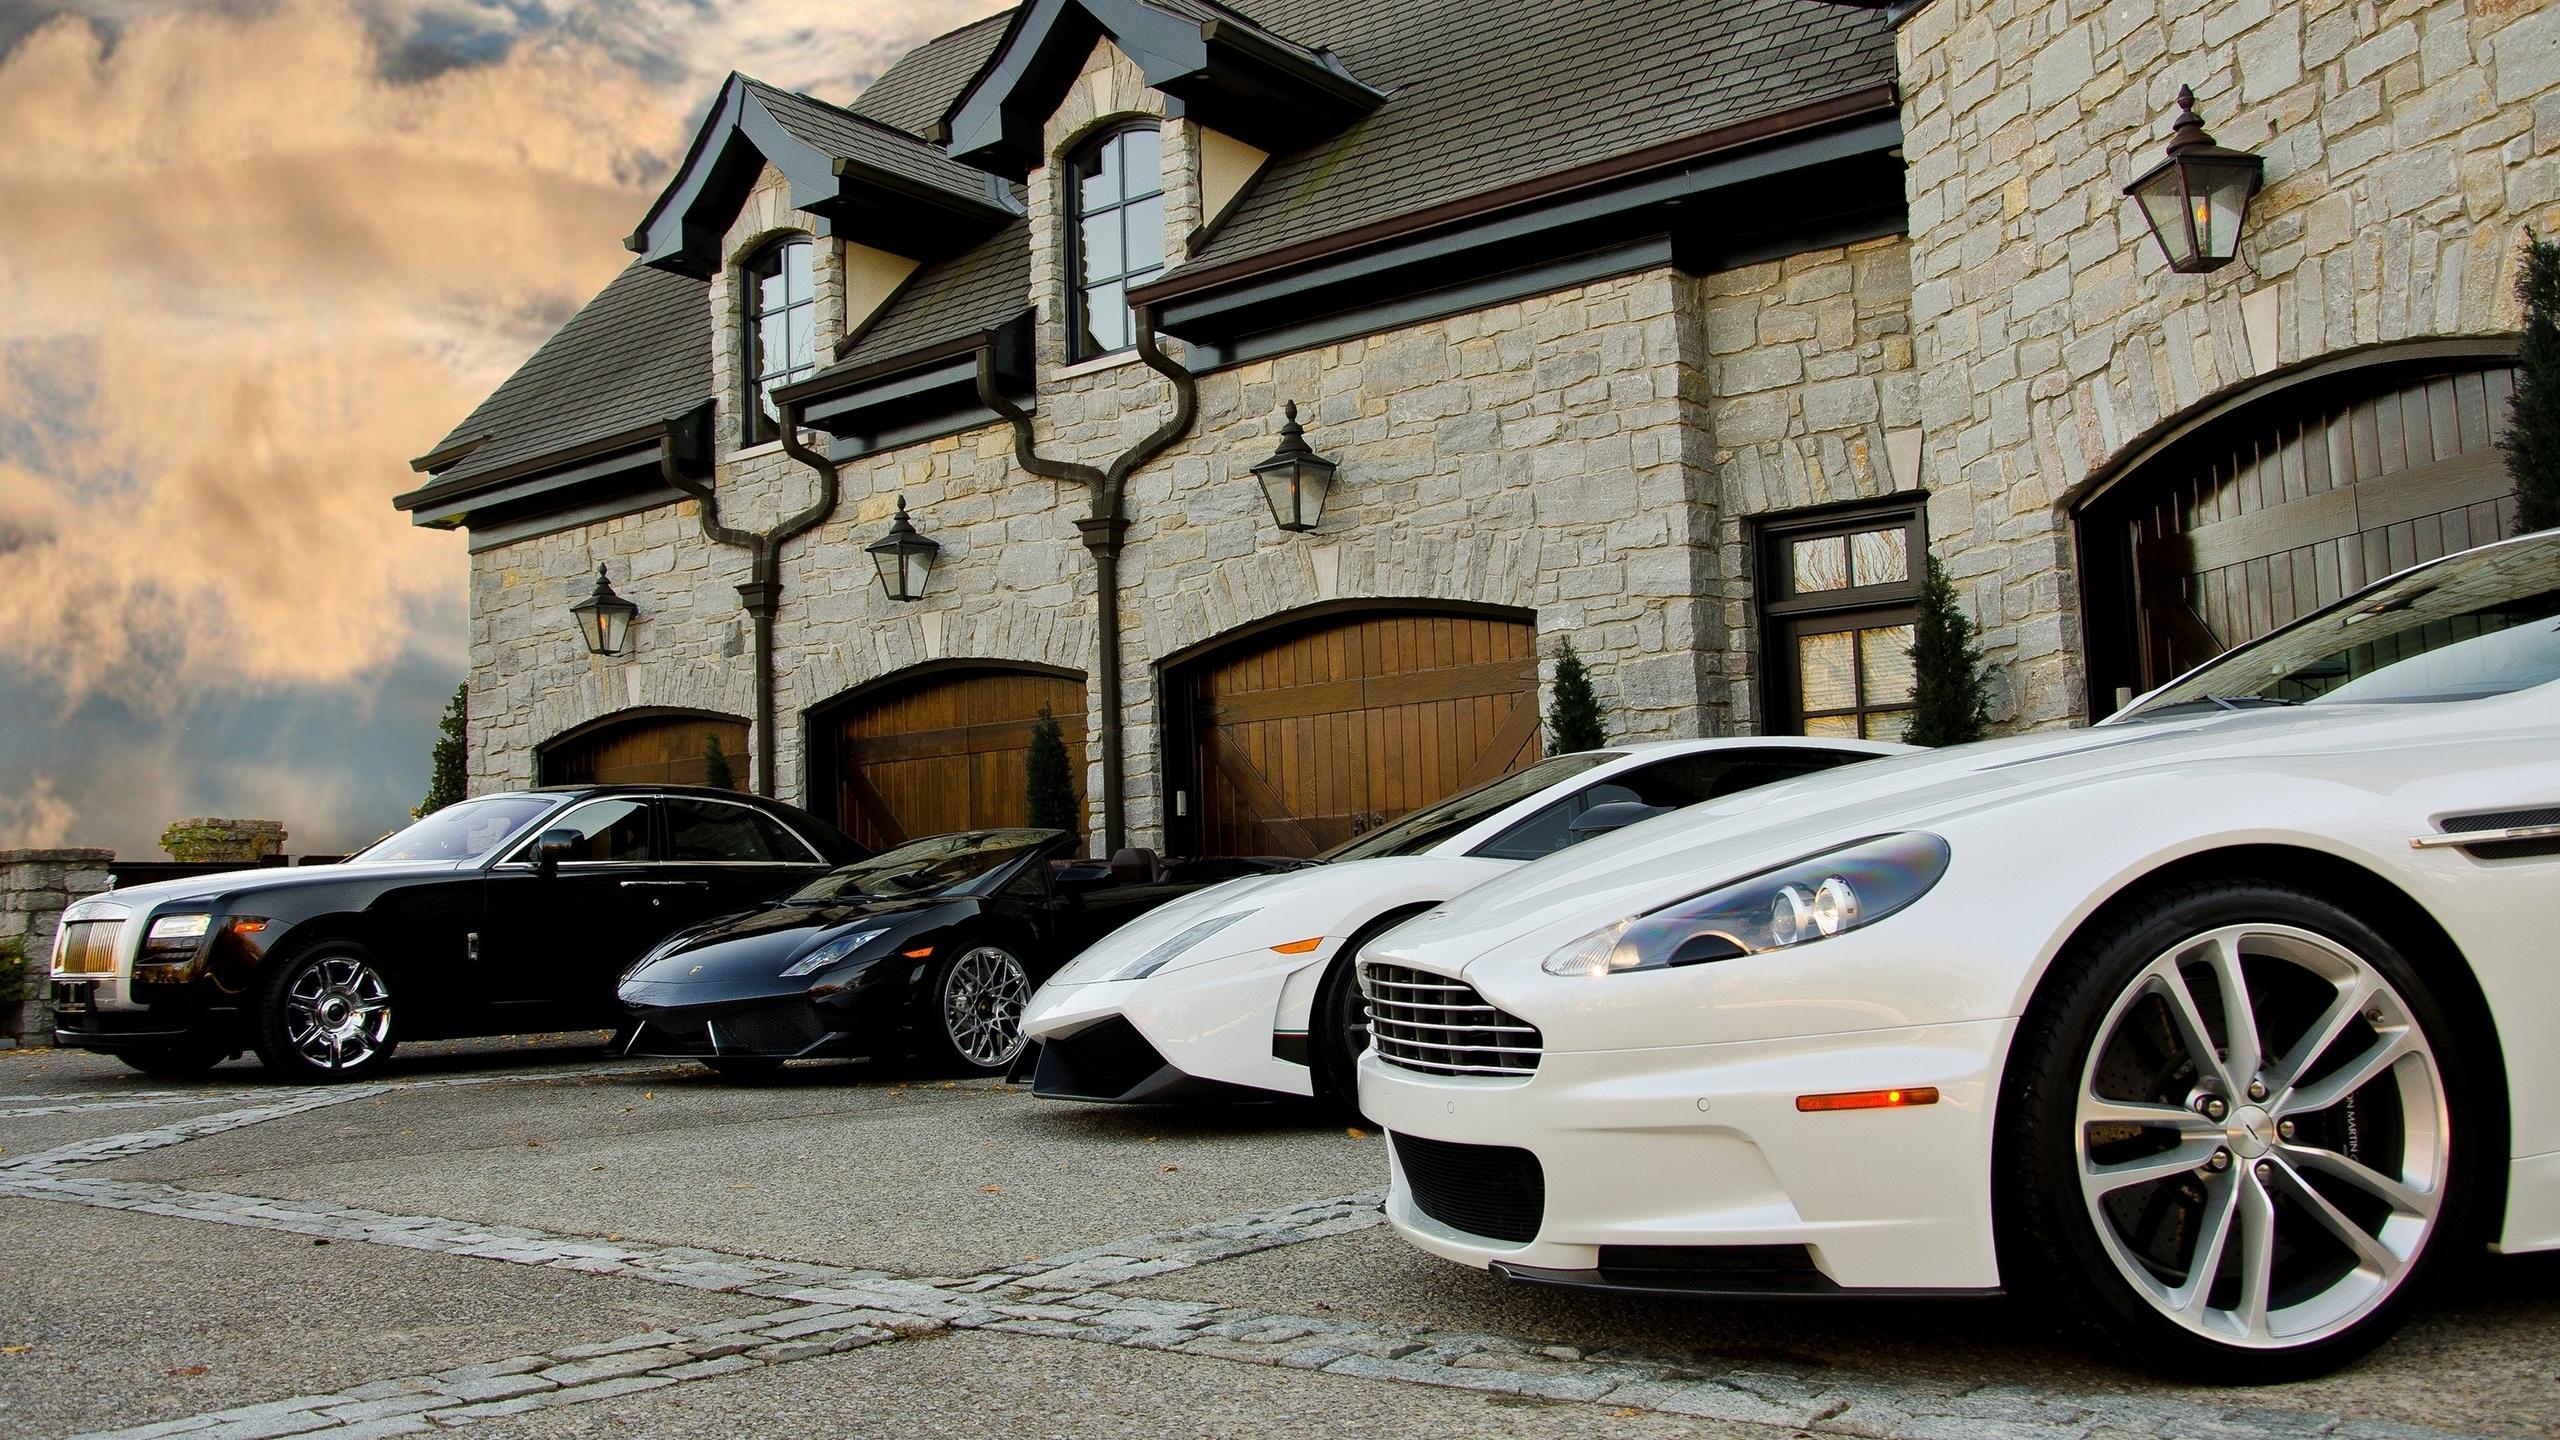 картинки дорогих домов и машин